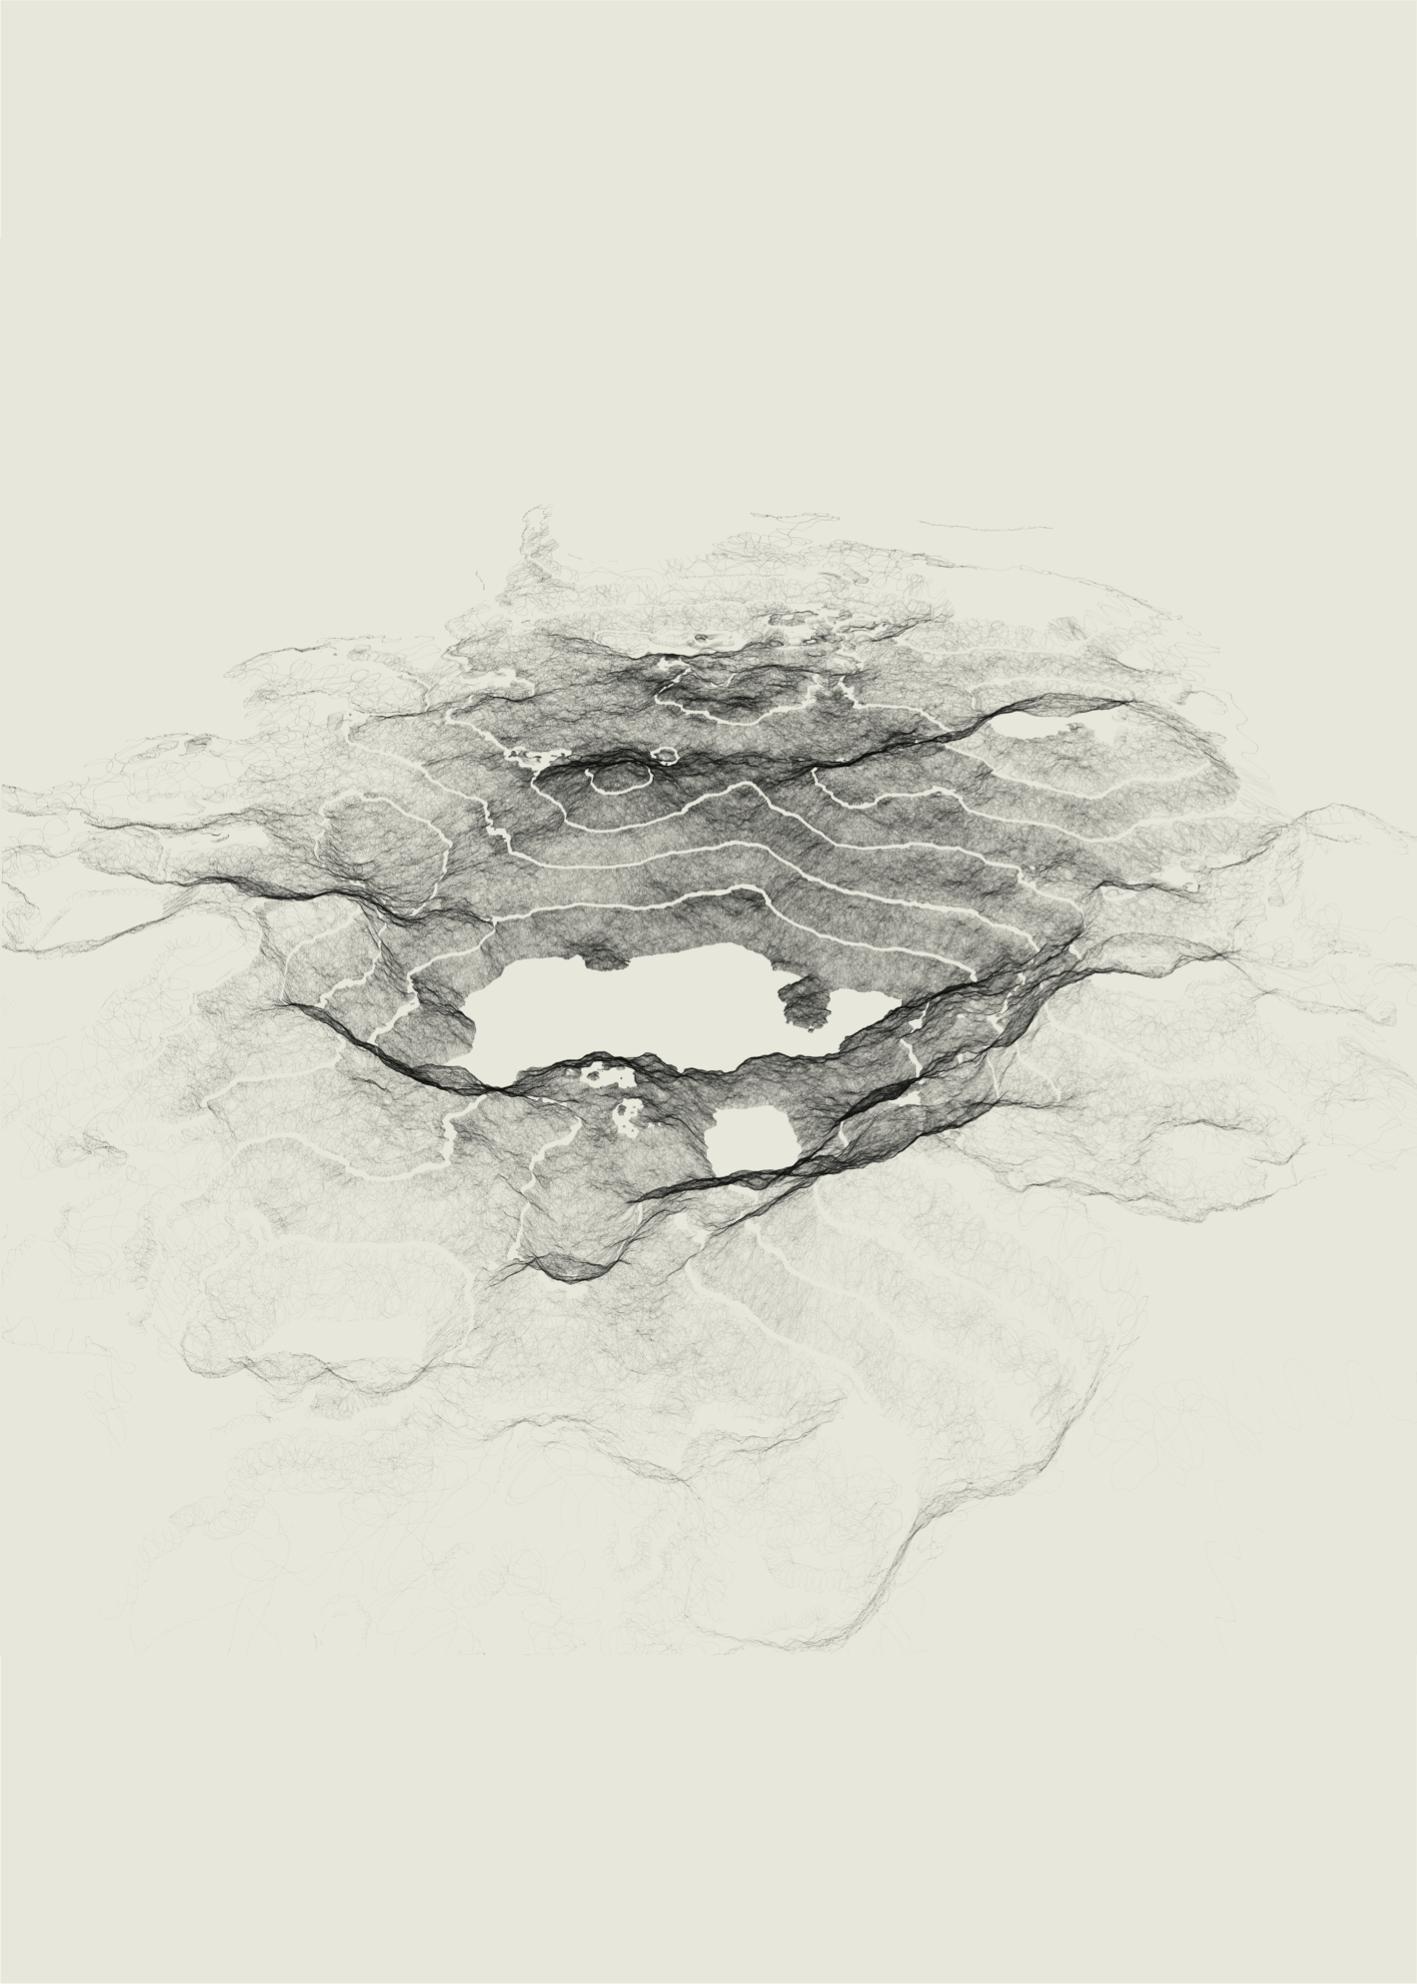 Image of Curvescape I